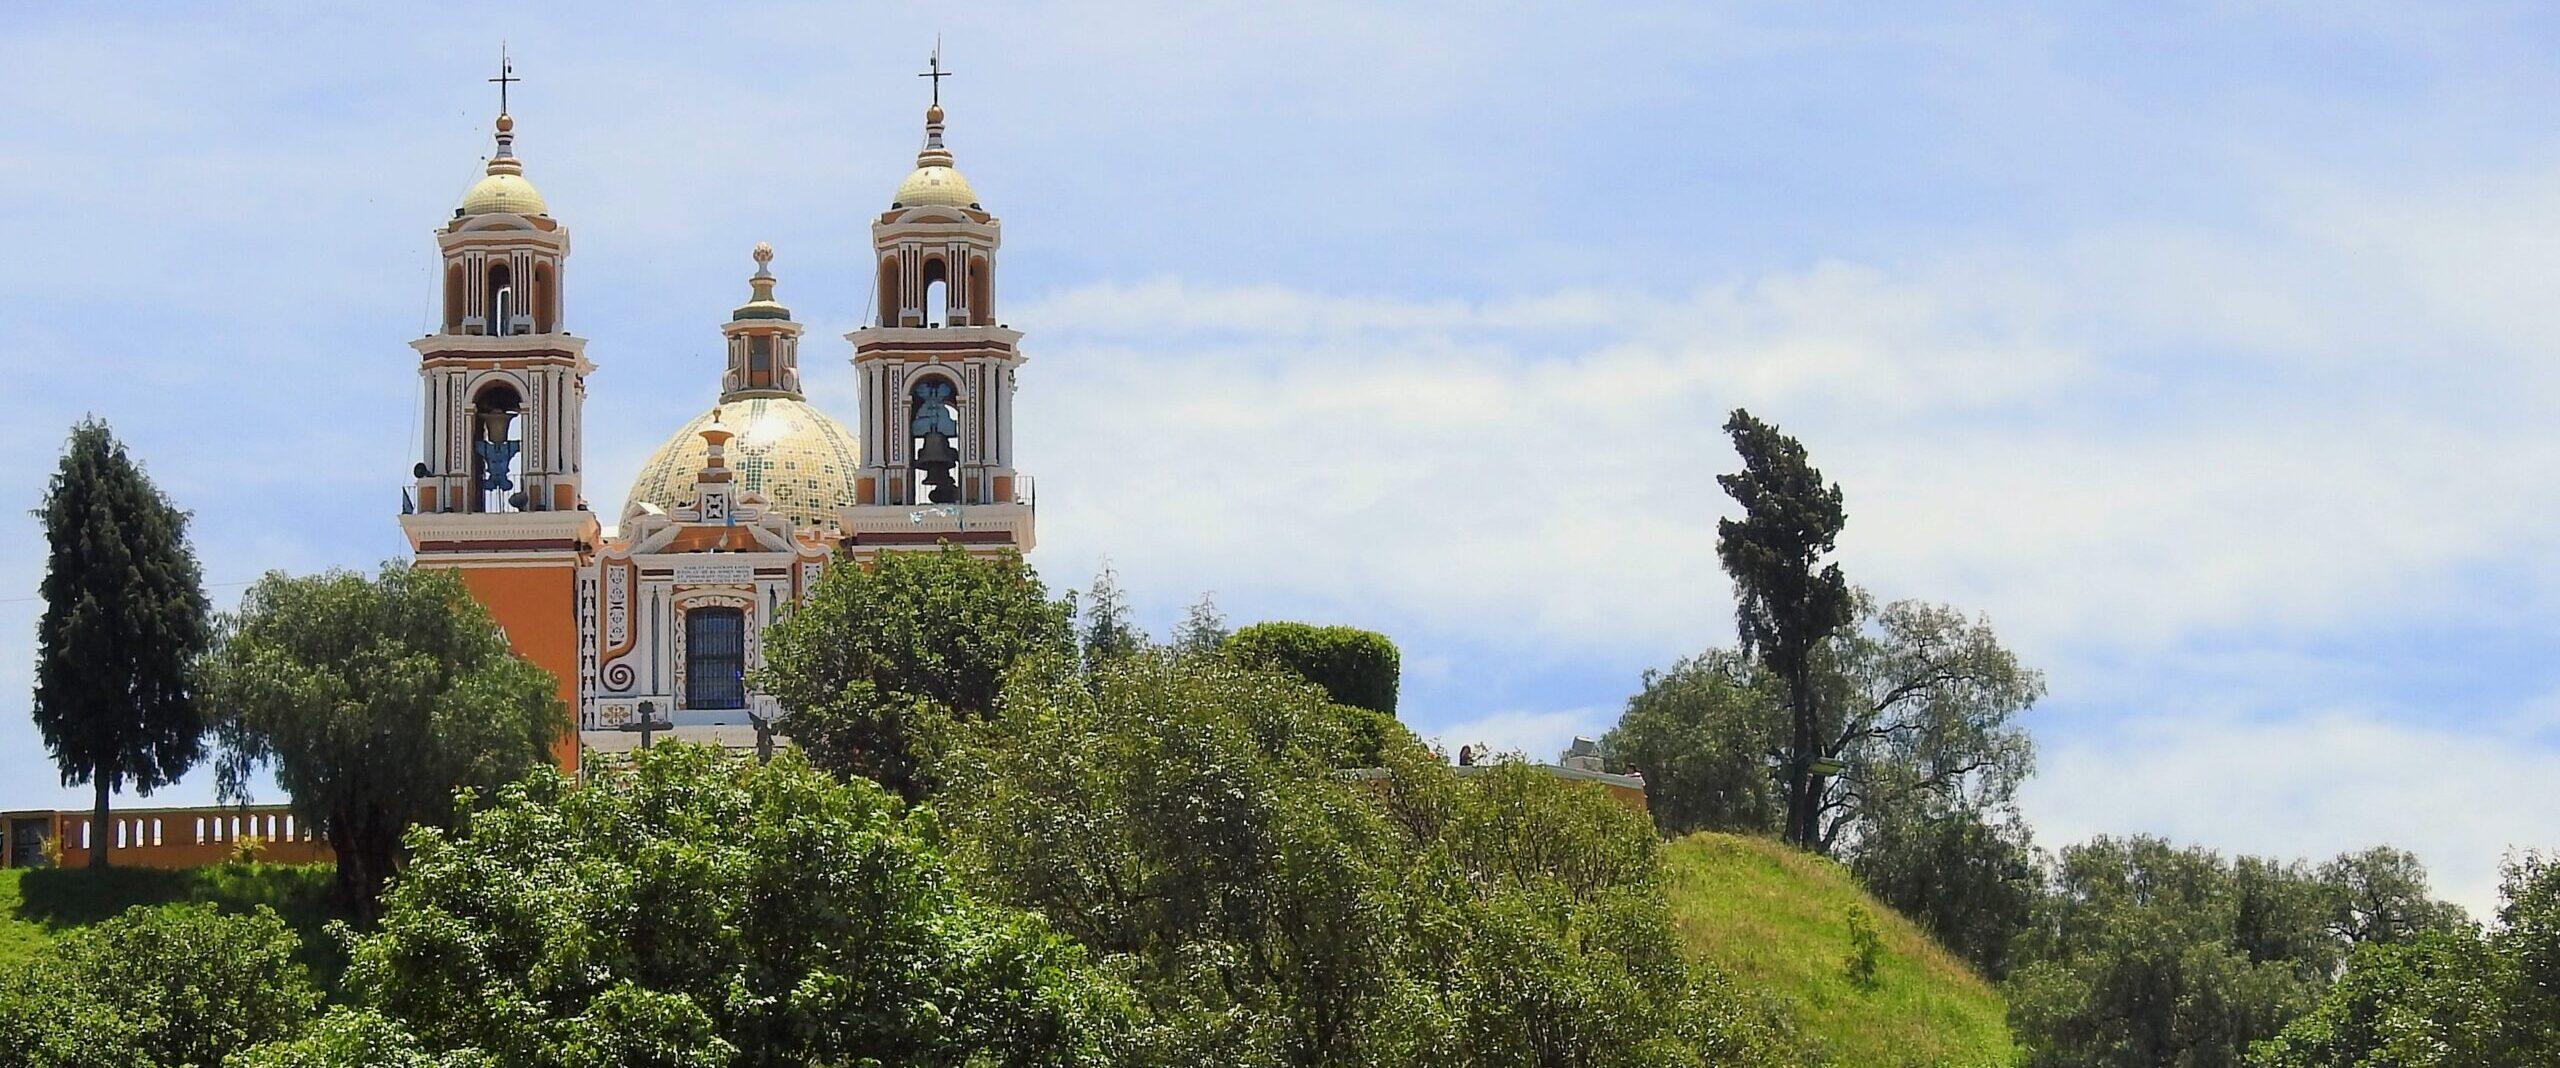 59 – México – Kolonialstädte